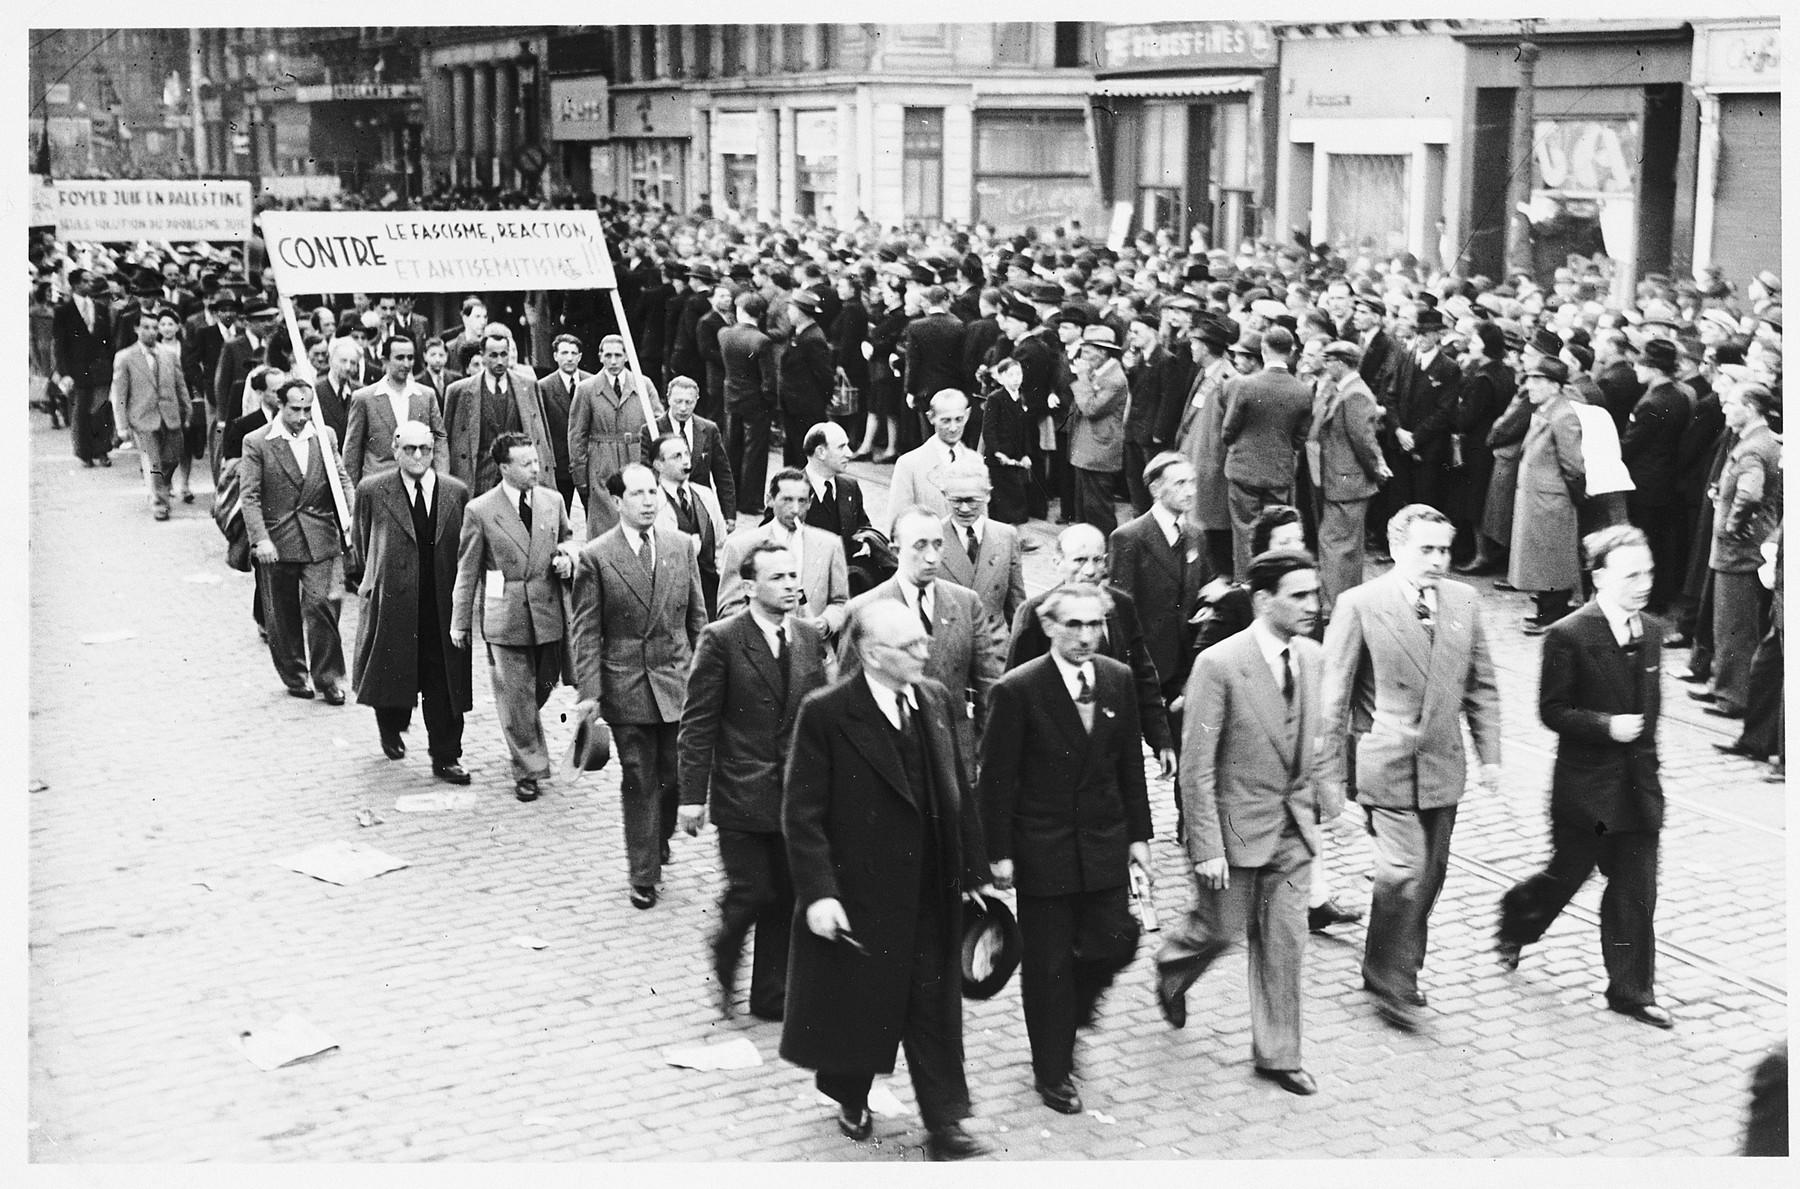 A postwar pro-Zionist demonstration in Belgium.